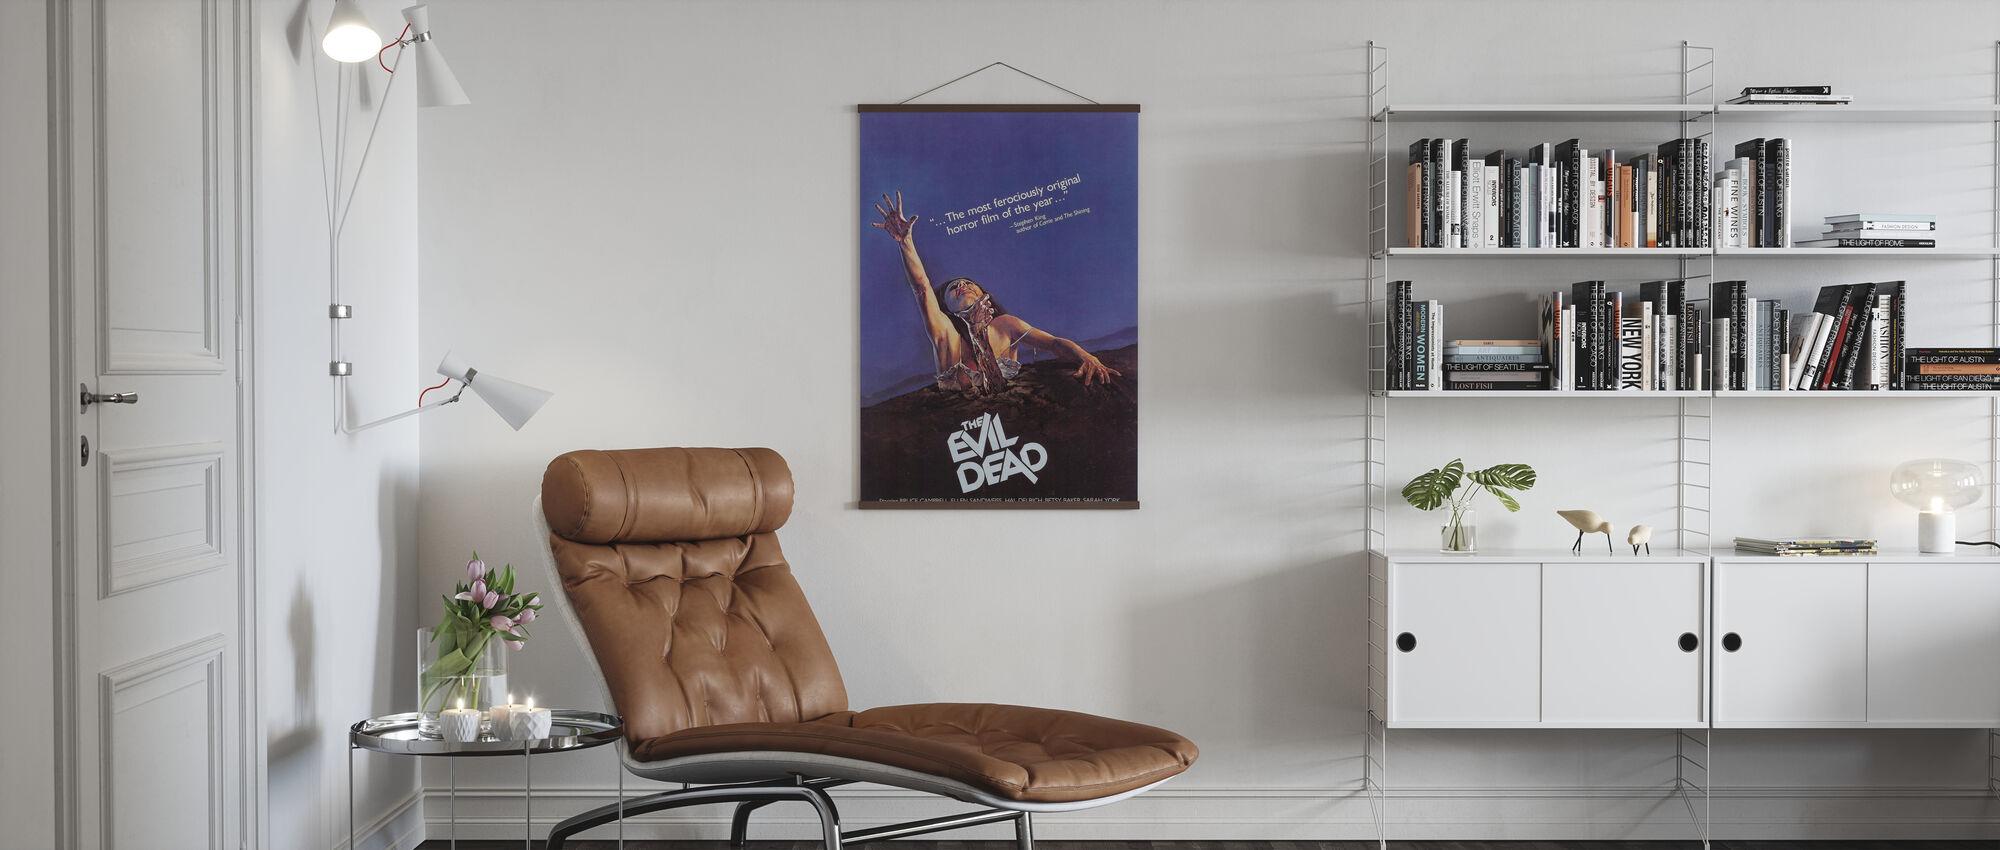 Kwaad Dood - Poster - Woonkamer